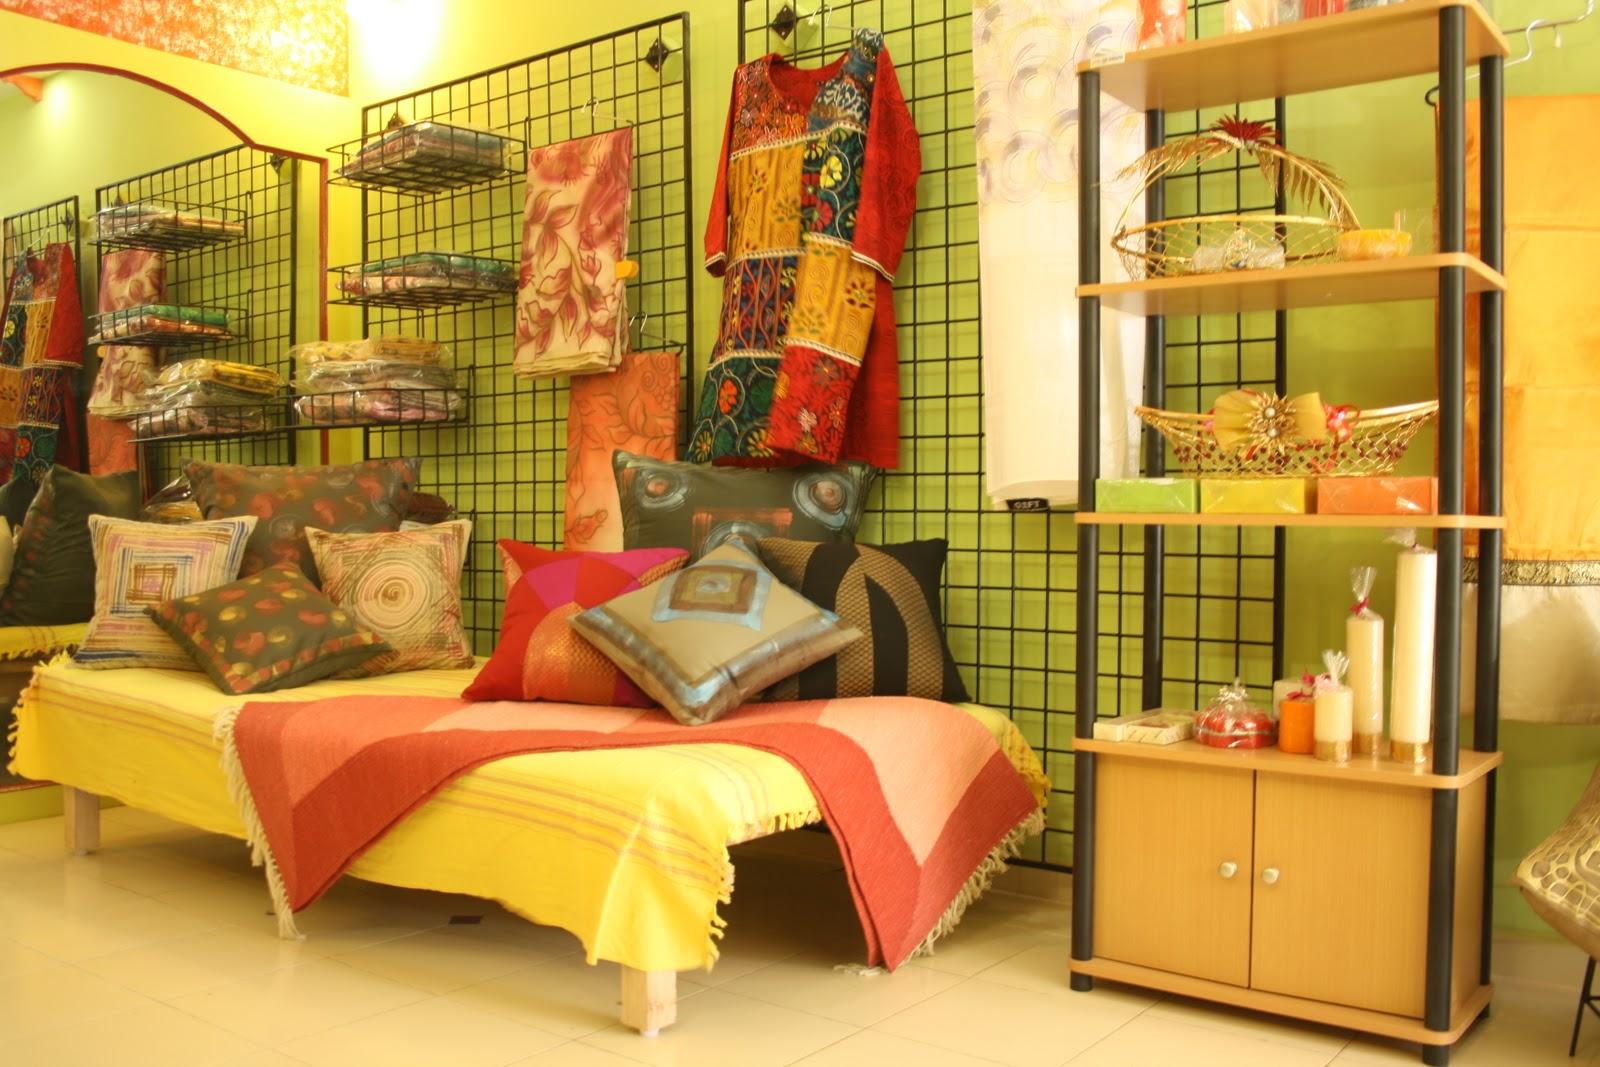 DESIGN MANDI CRAFT HUB: HANDICRAFTS & HOME DECOR